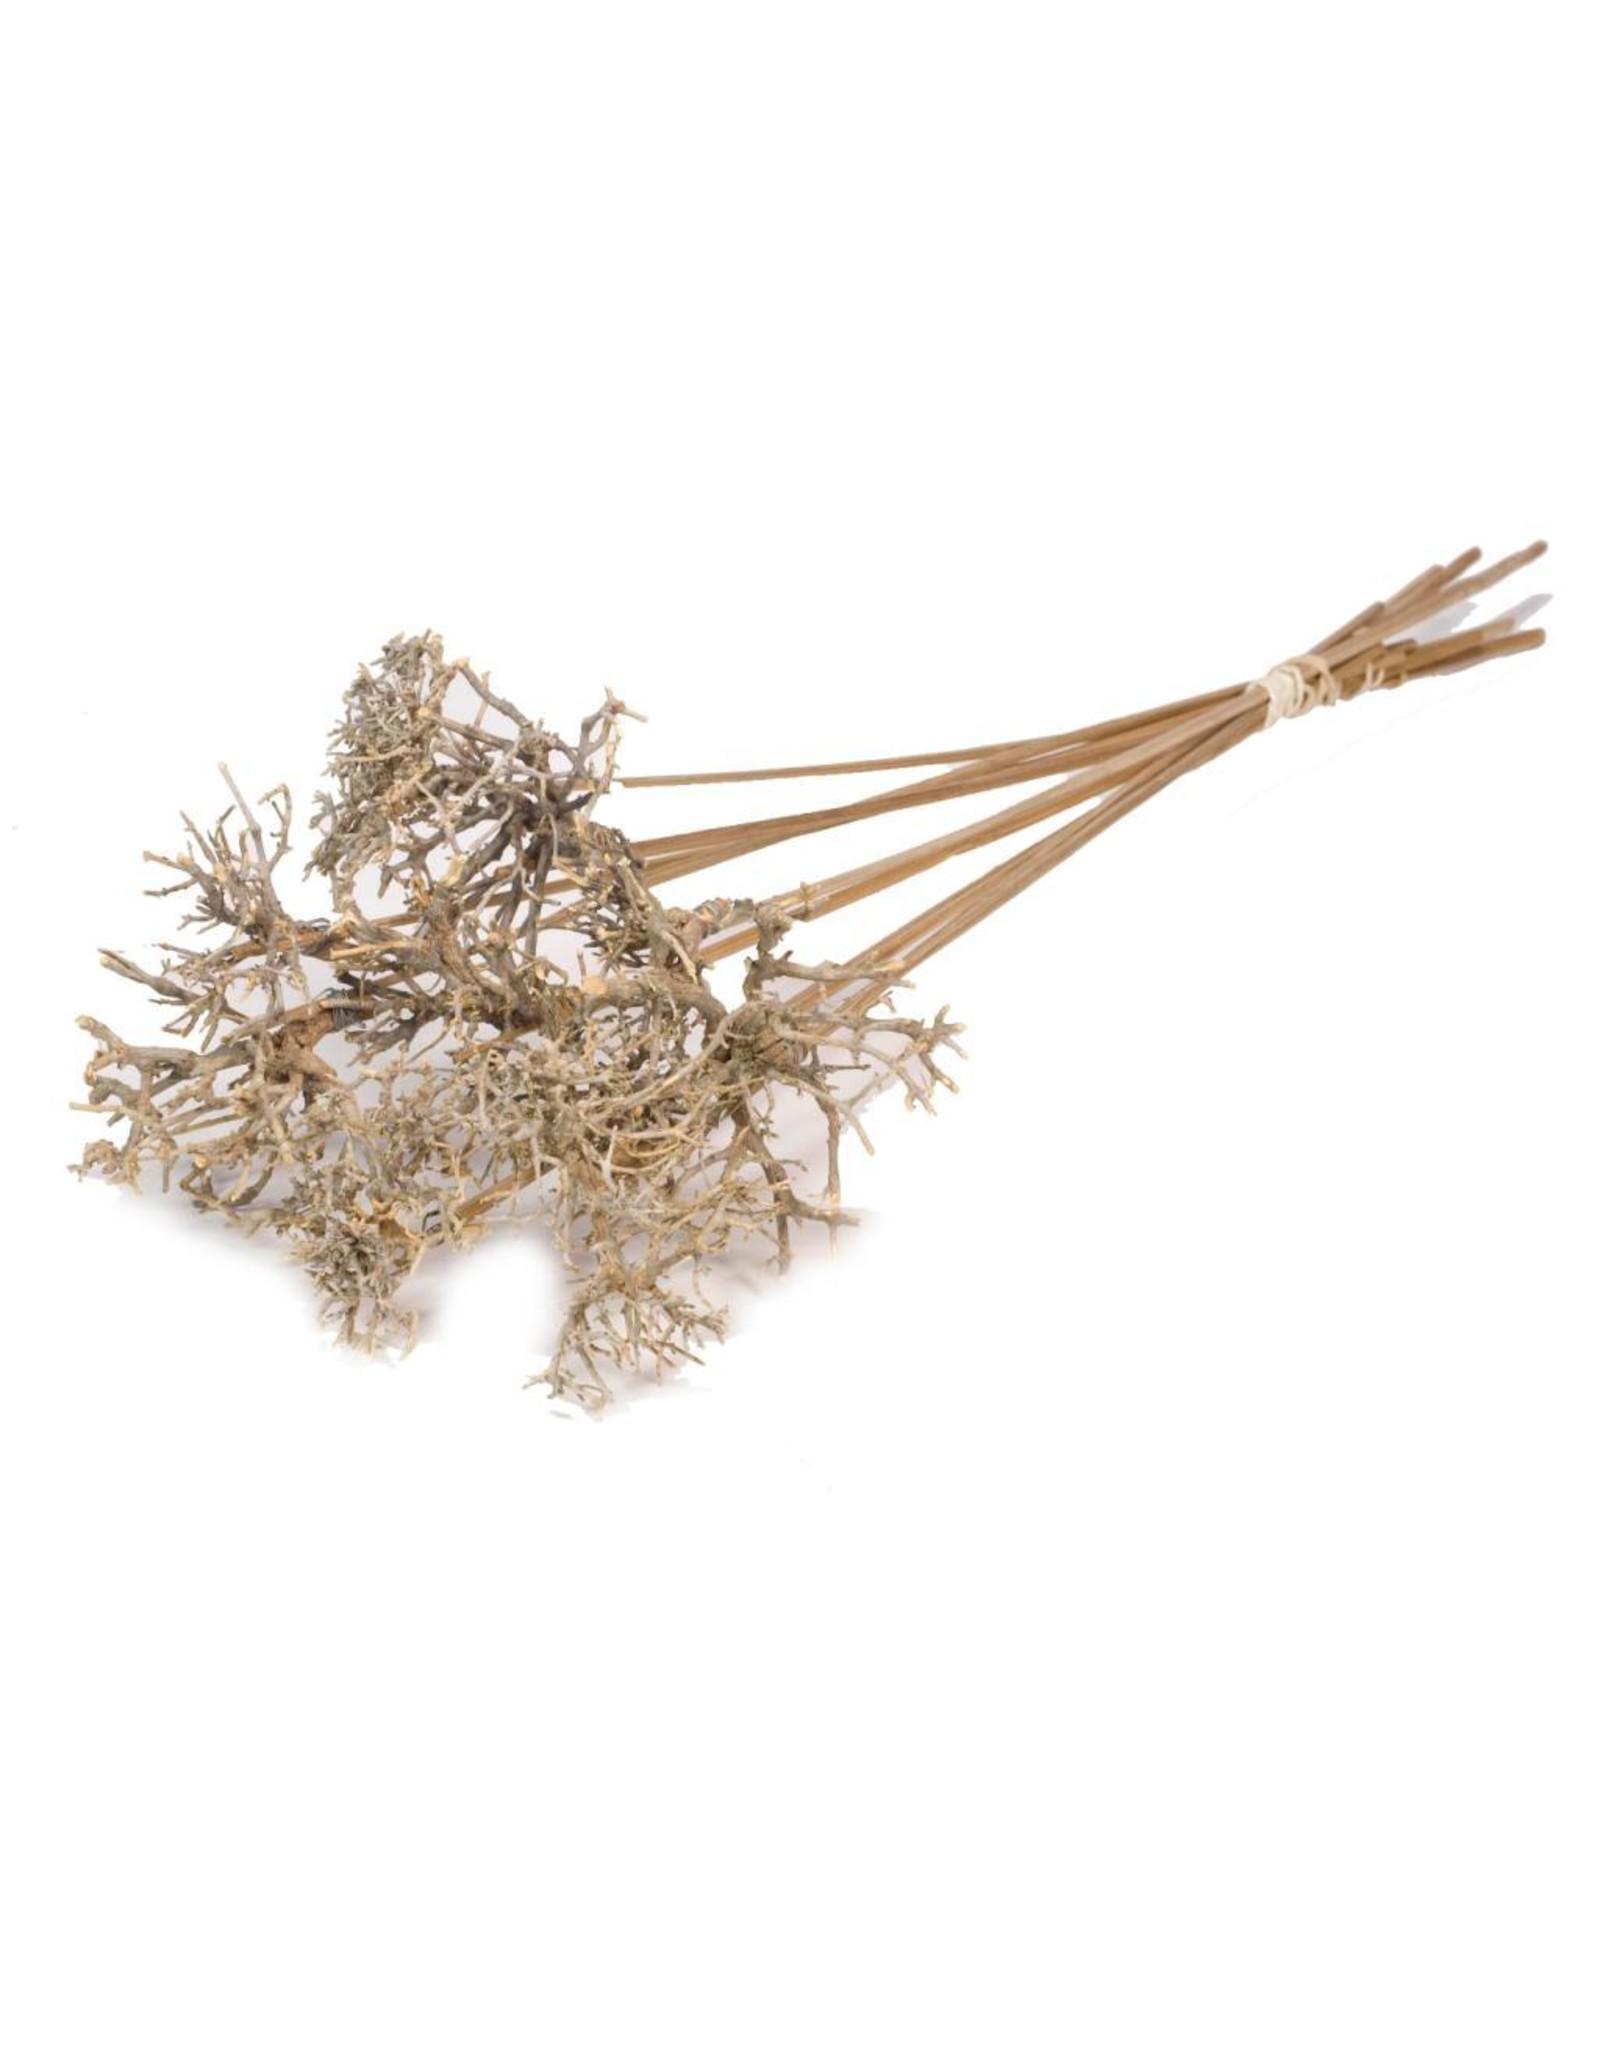 Drytree on stem 10pc SB natural x 2